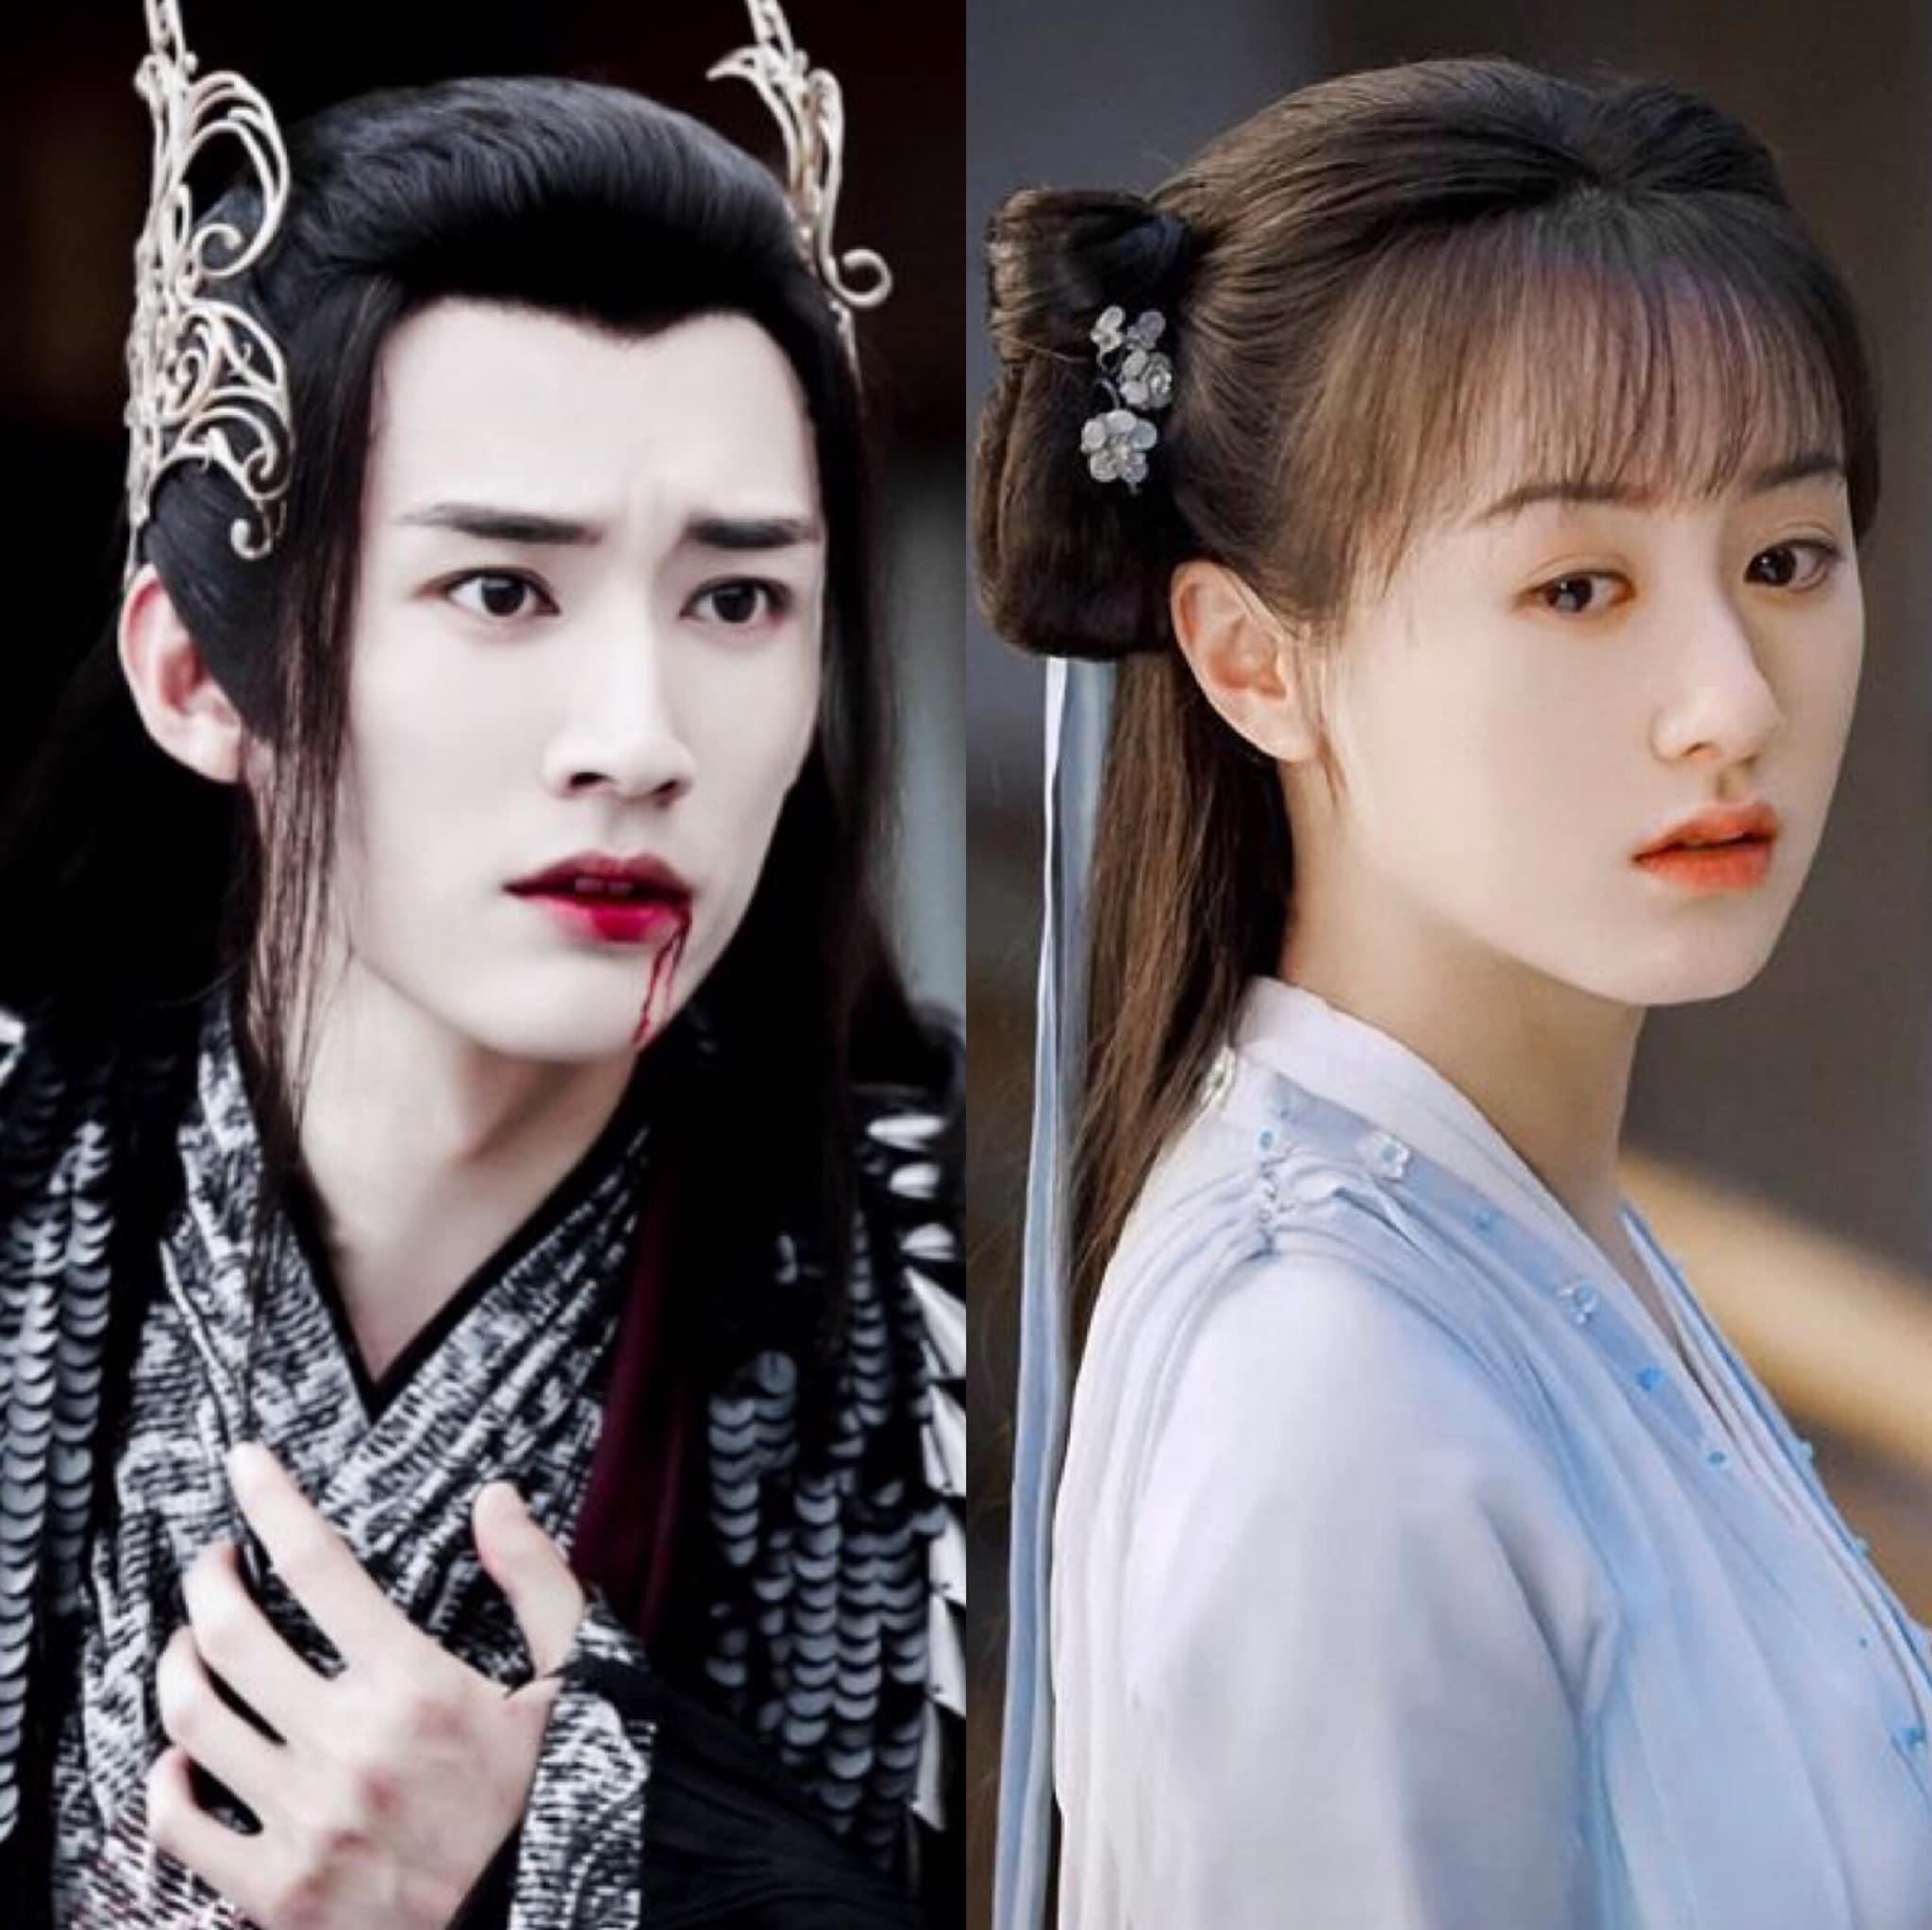 Mùa Hoa Rơi Gặp Lại Chàng - Love Never Fails (2021)